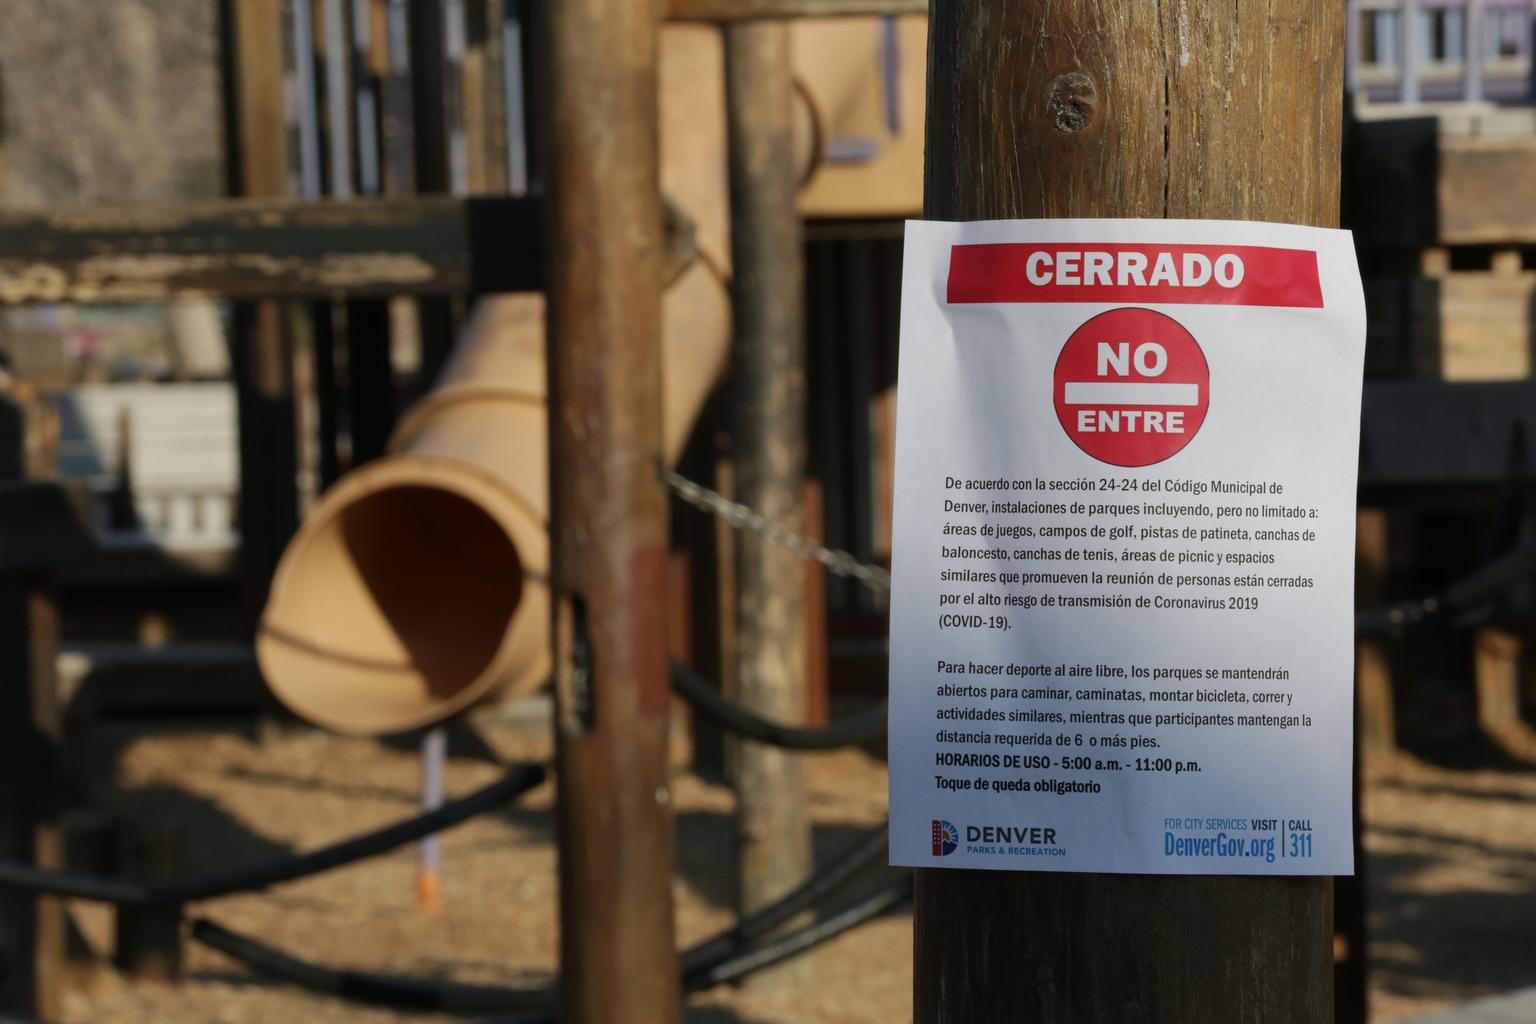 Coronavirus Denver City Park community-built playground is closed